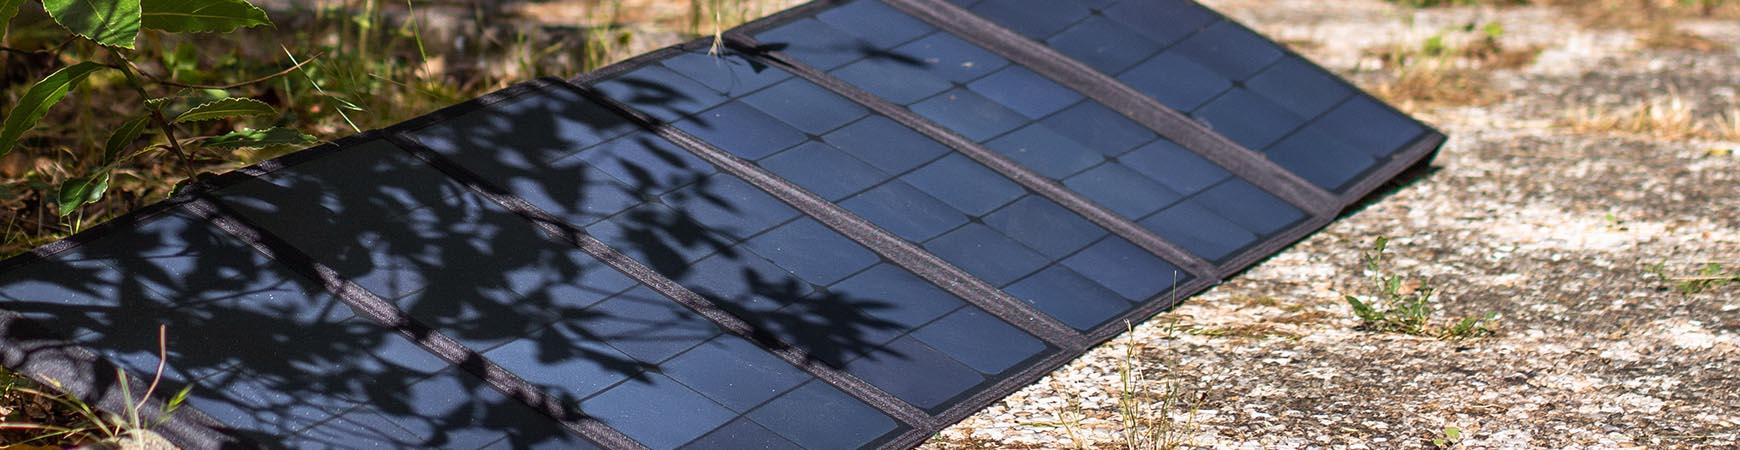 Foldable solar panel 30W